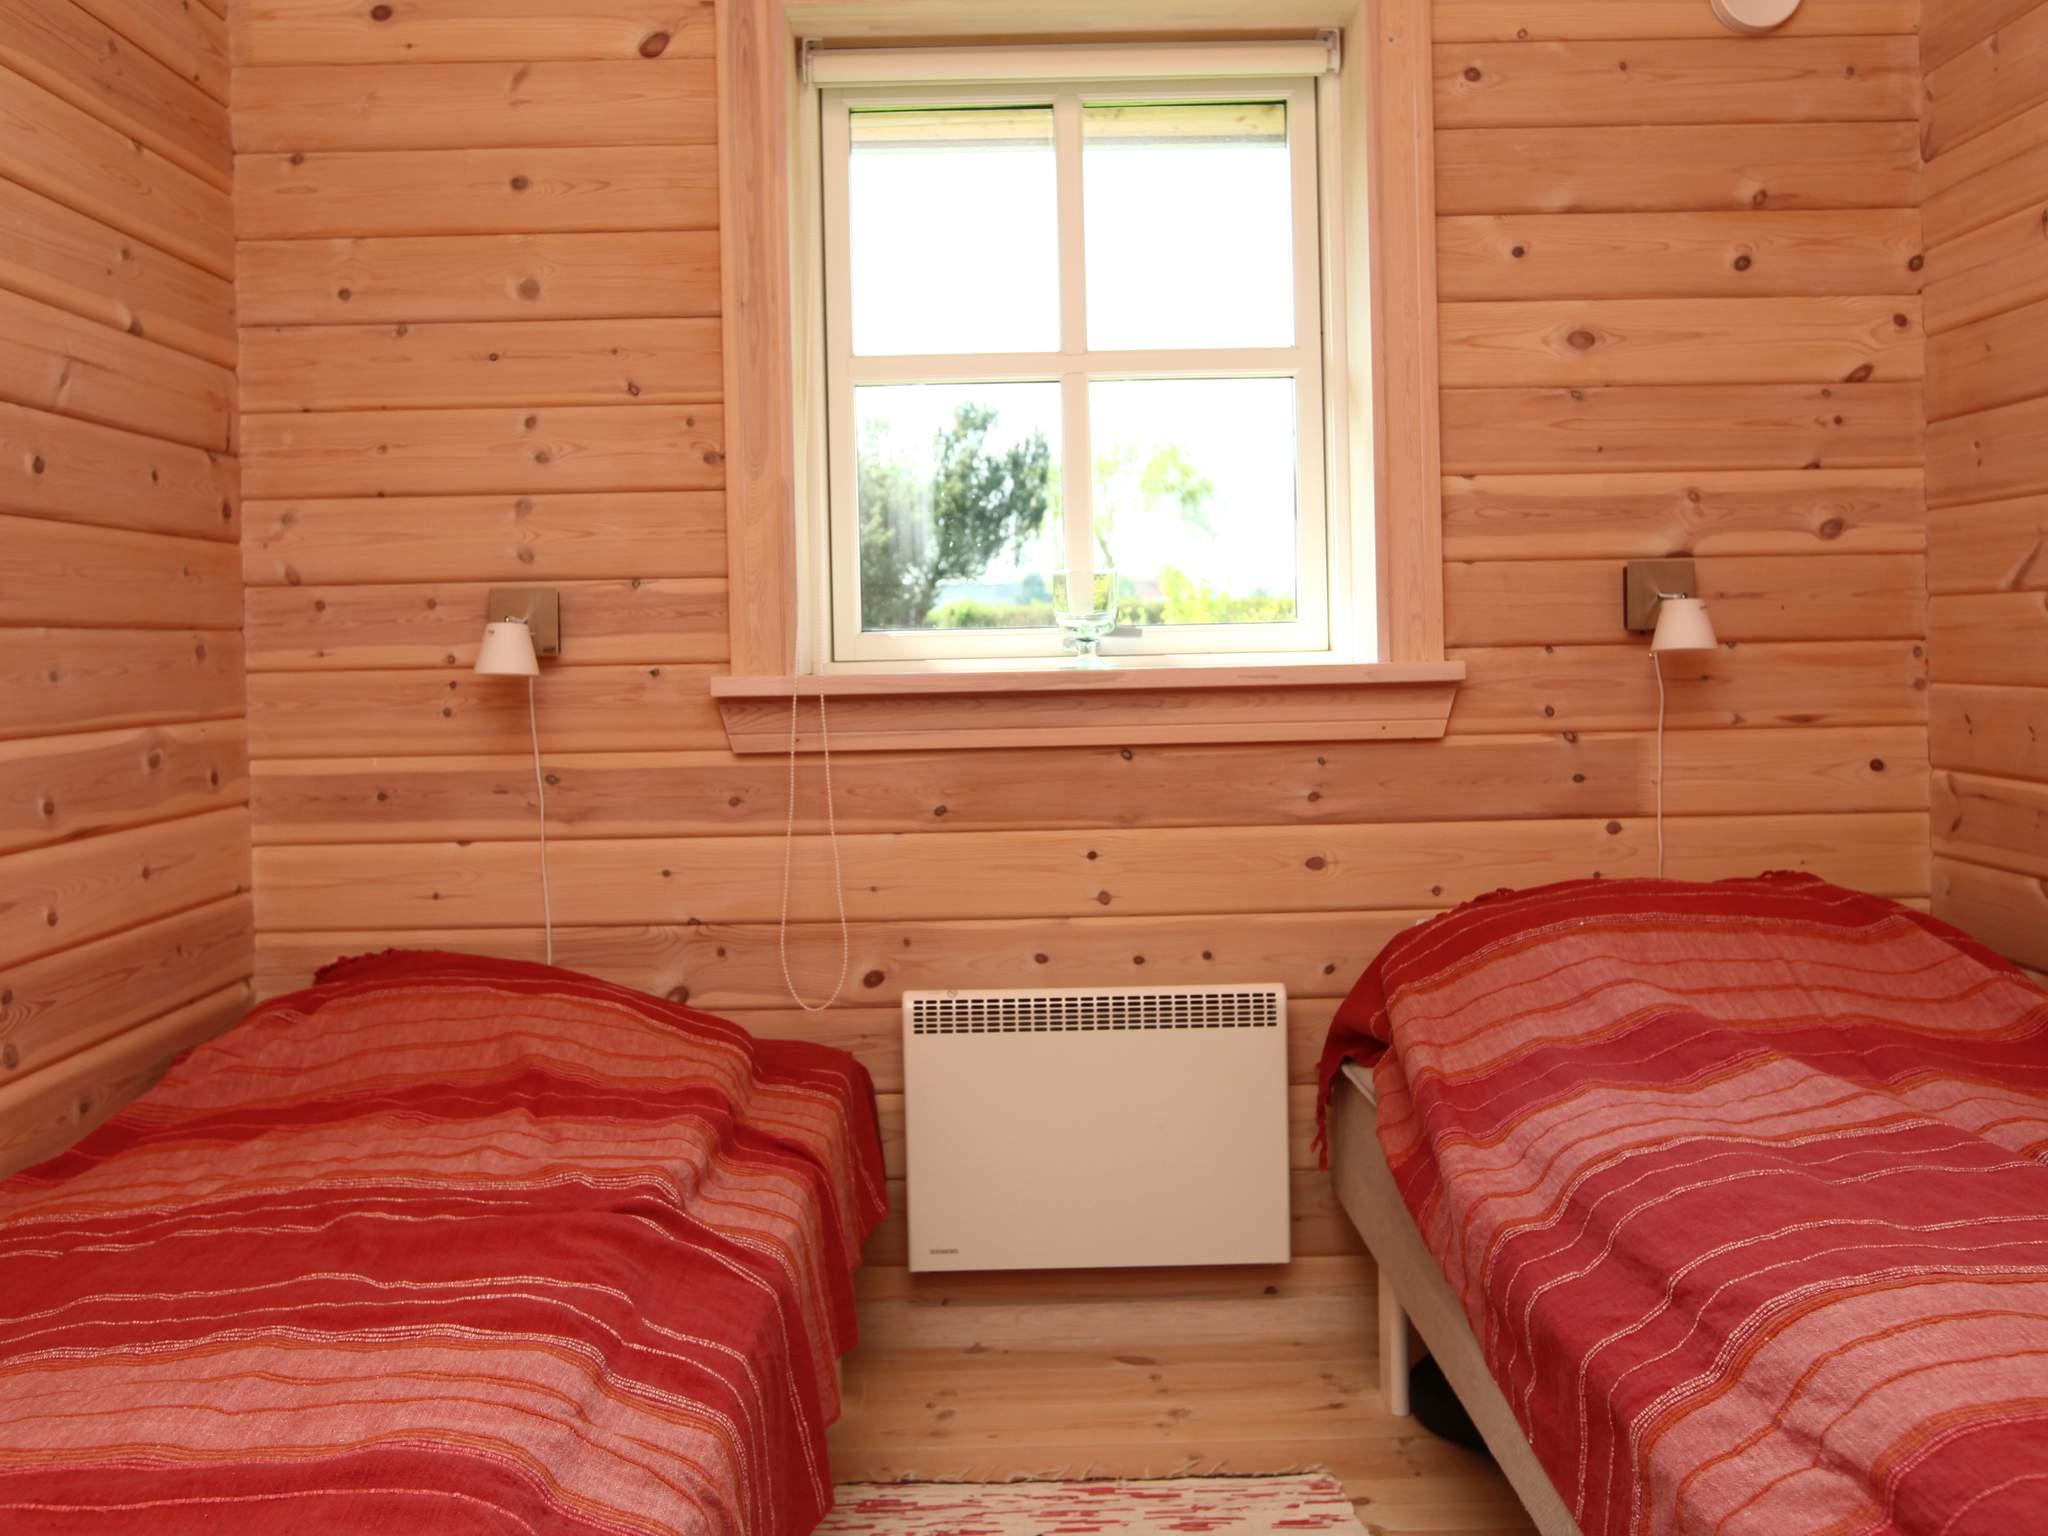 Ferienhaus Hyllingeriis (561298), Skibby, , Nordseeland, Dänemark, Bild 11